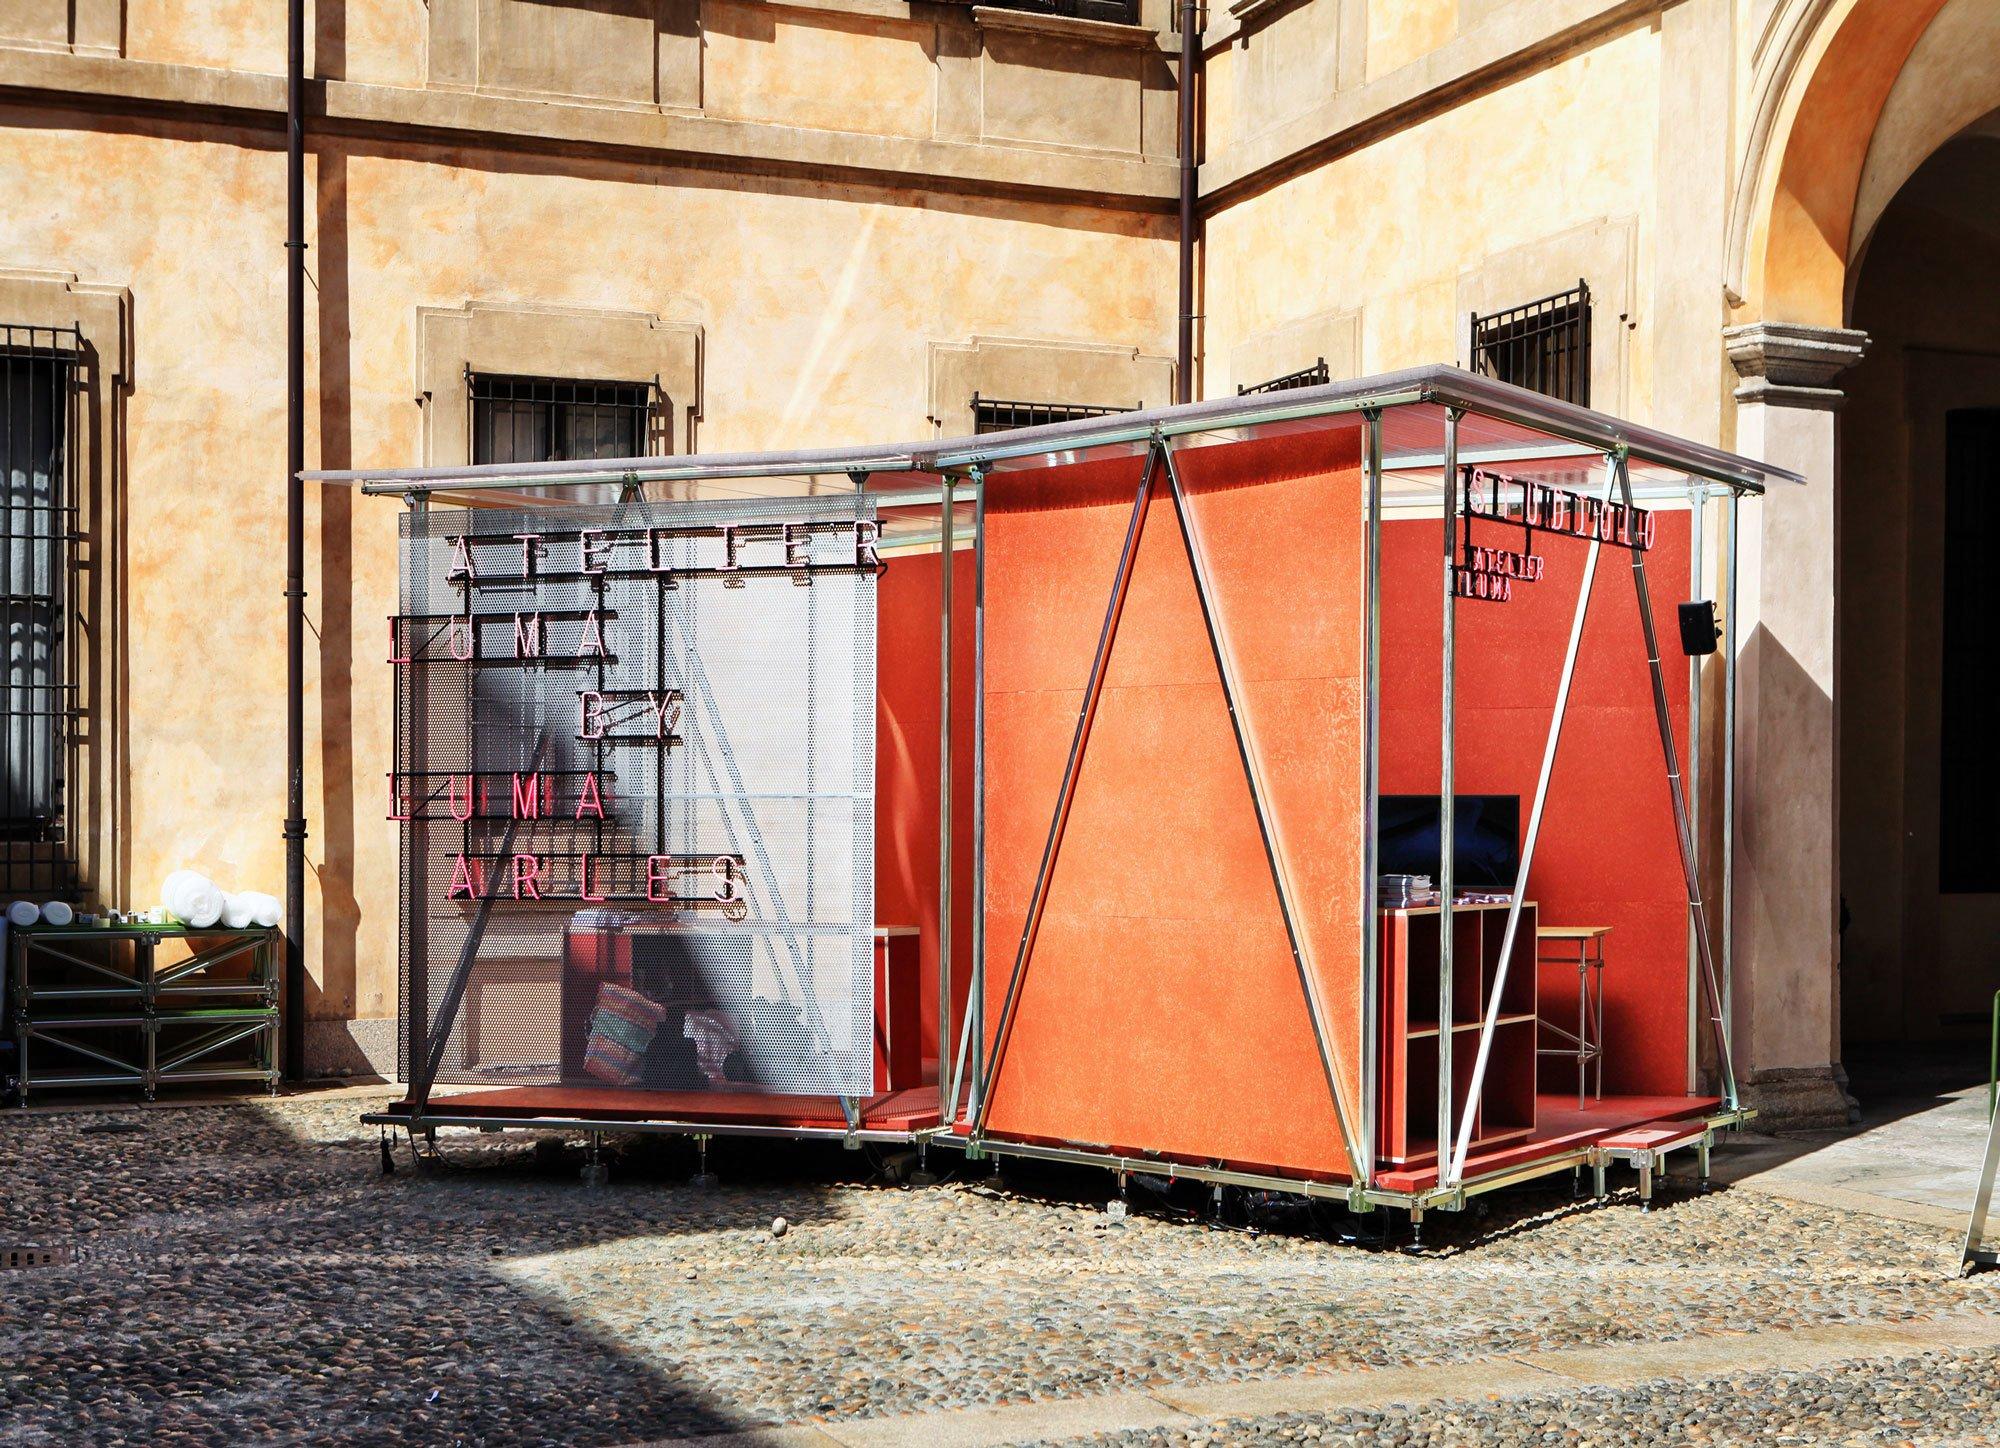 Pavillon für Atelier LUMA, LUMA Arles, im Hof des Palazzo Clerici im Rahmen des Mailänder Salone del Mobile 2018. Foto: Studio Lukas Wegwerth